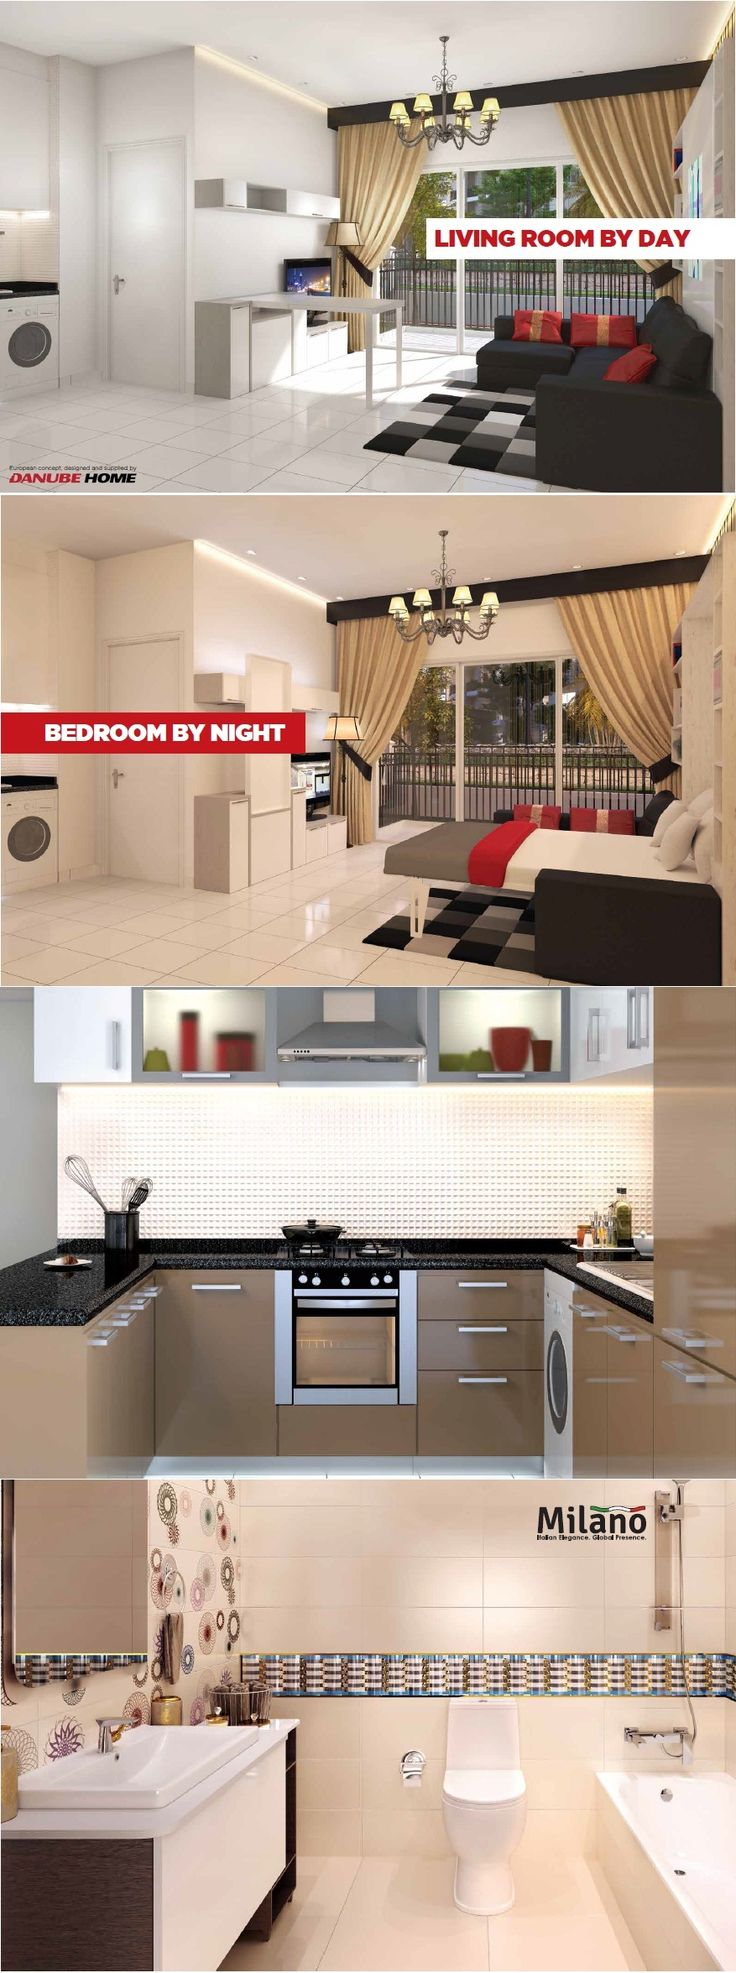 Danube Resortz Residence Dubai - Exclusive Offers by Auric Acres Real Estate Dubai UAE #danubedubai #danuberesortz #danuberesortzresidence http://www.auric-acres.com/danube-resortz-residence-dubai/